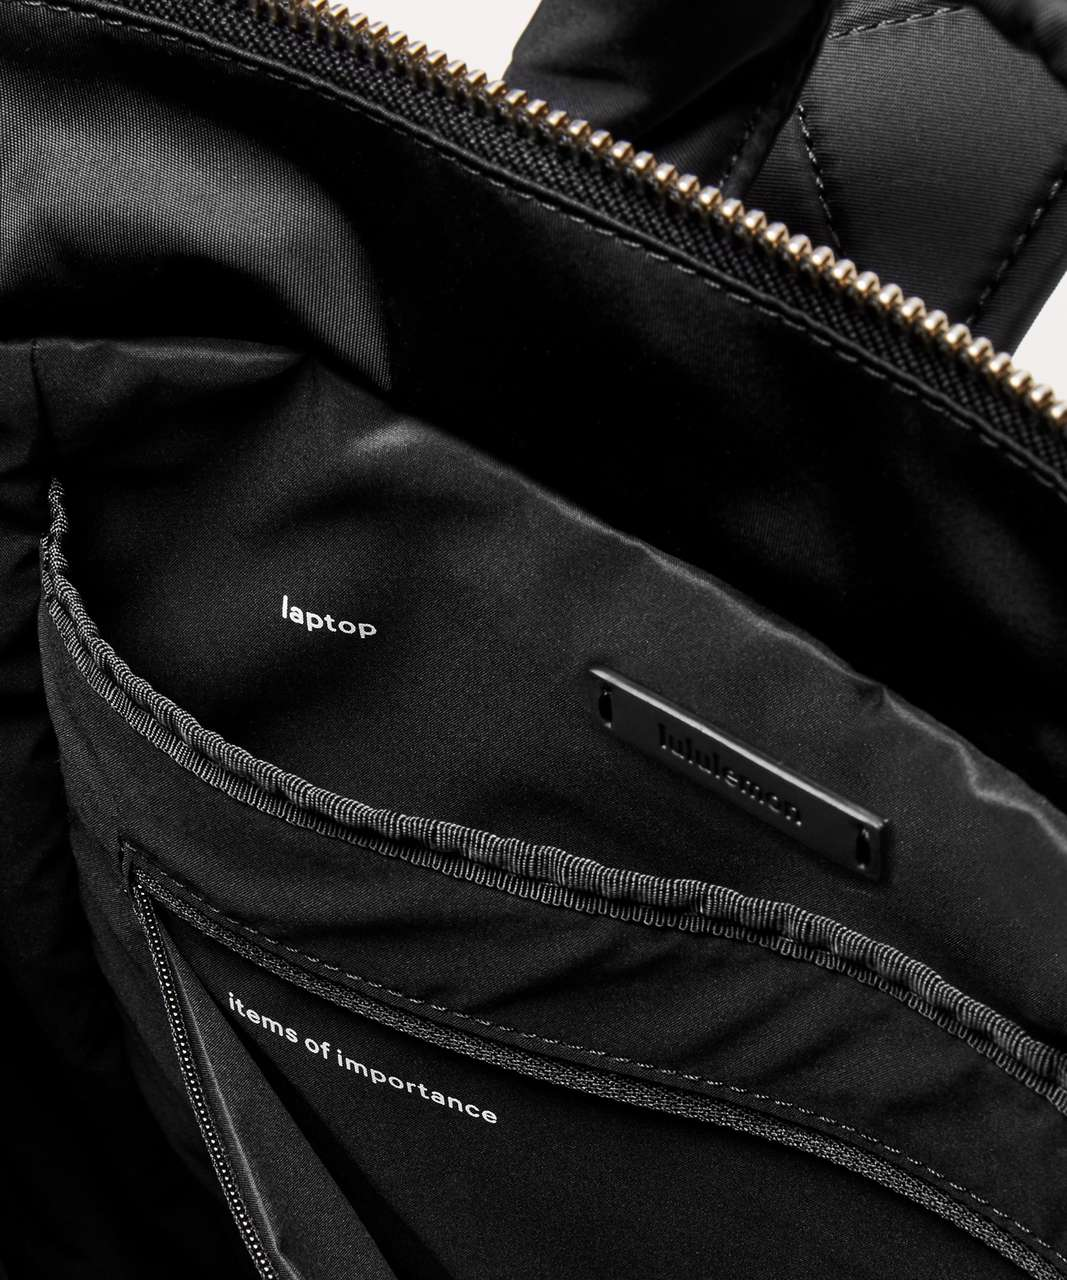 Lululemon City Adventurer Convertible Backpack 15L - Black